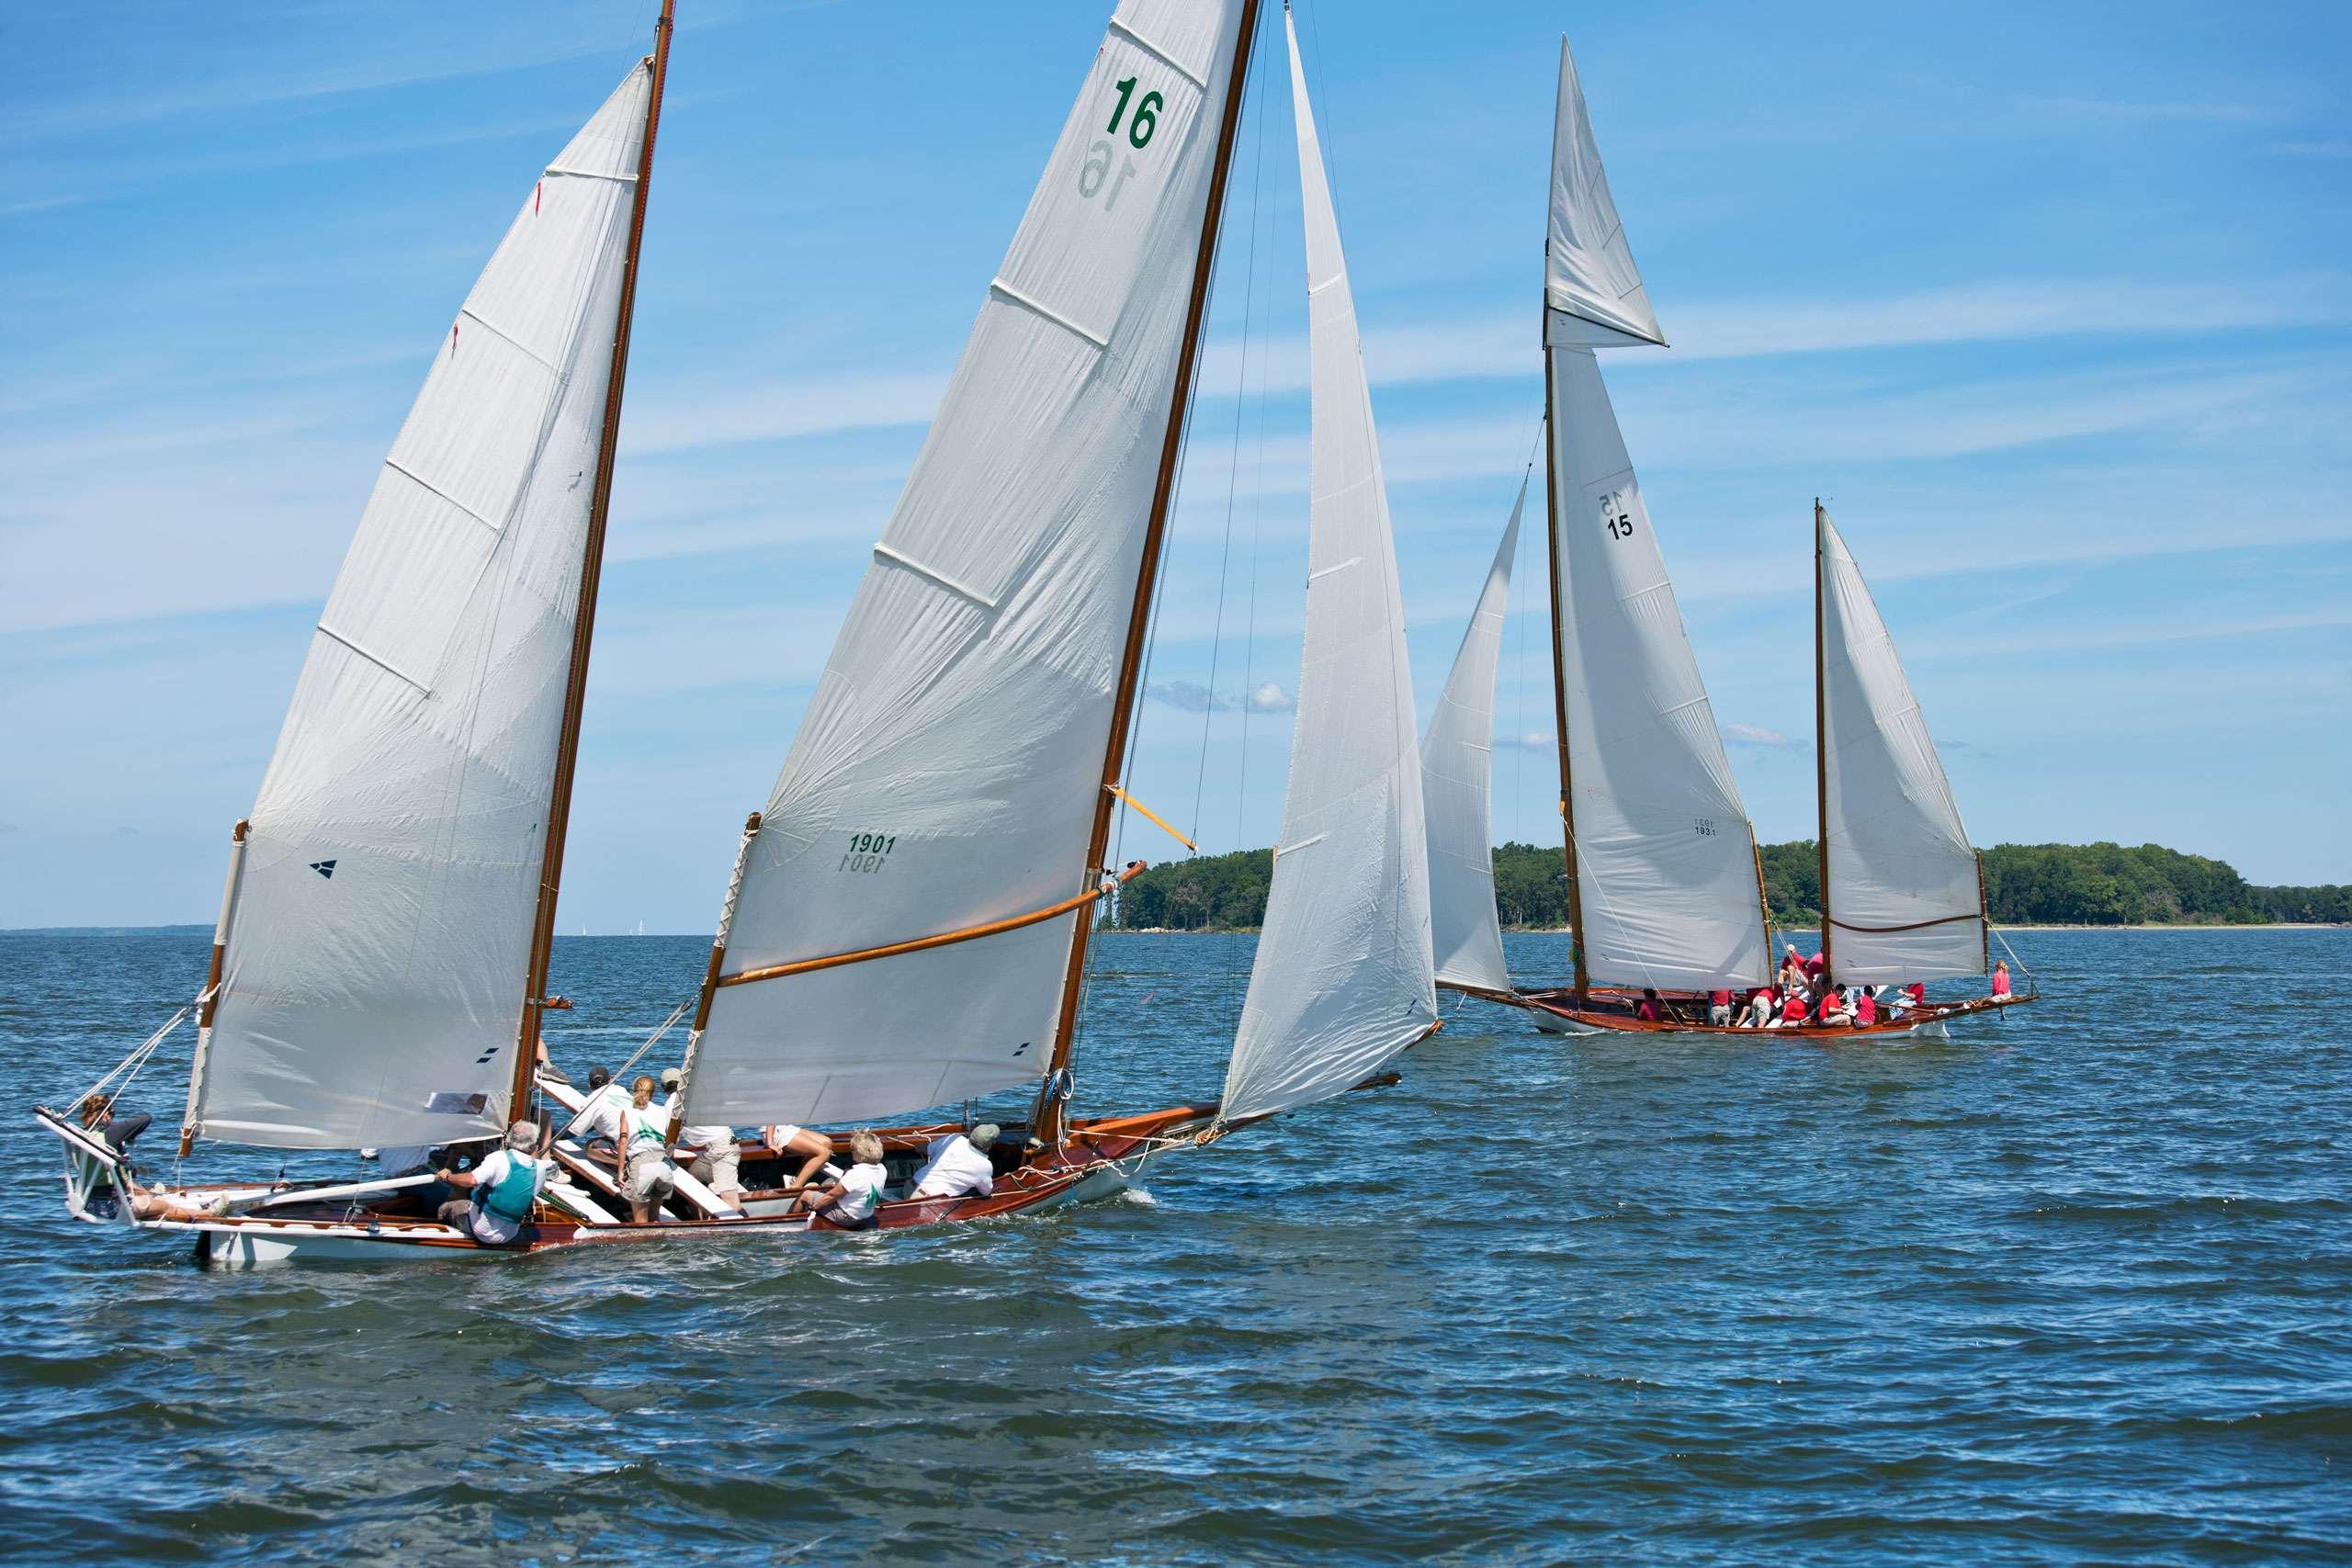 PORTFOLIO - Sailing - Log Canoes #19   PCG579